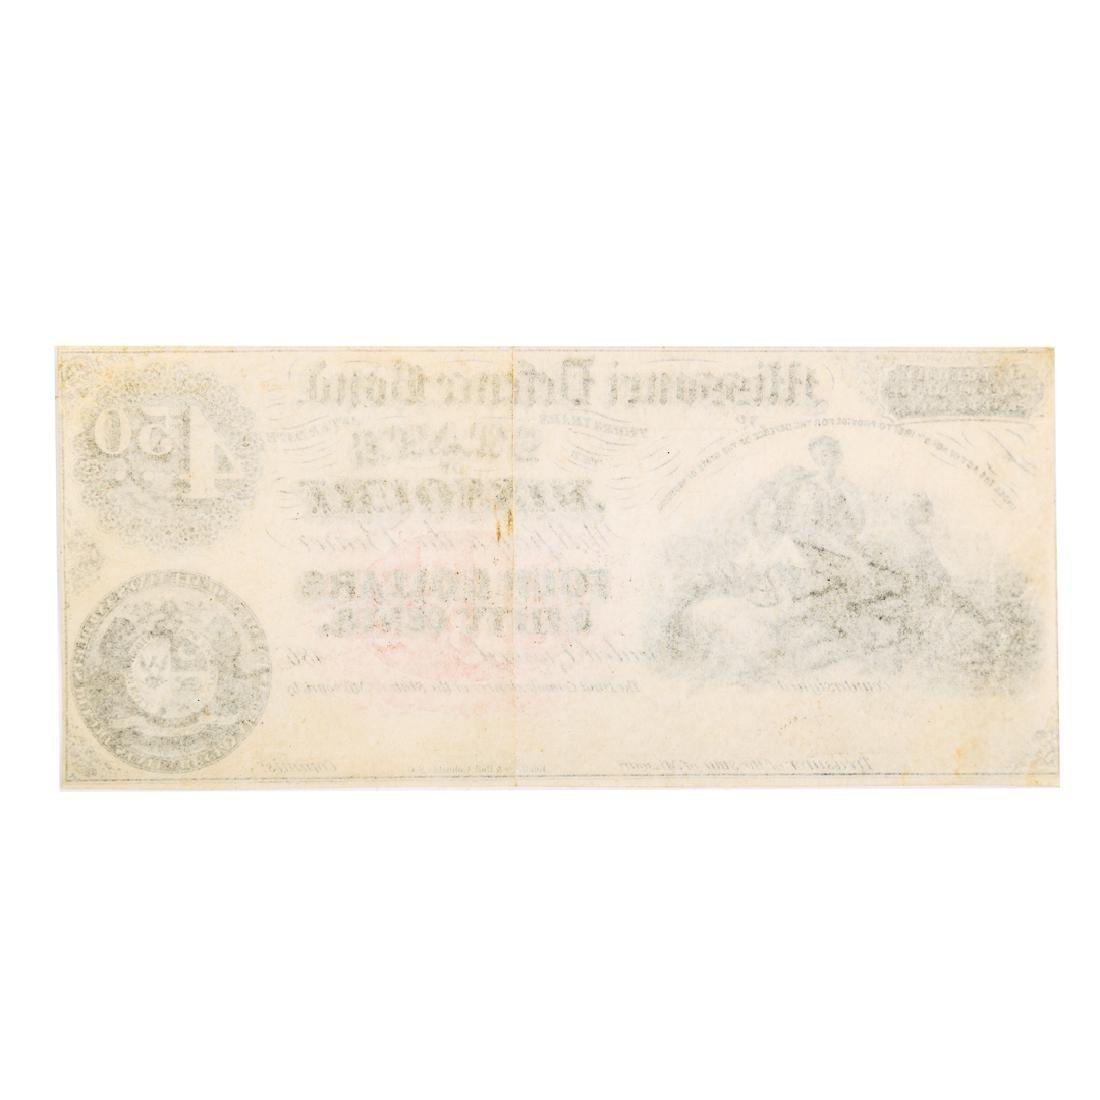 [US] Missouri Defence Bond $4.50 Remainder - 2